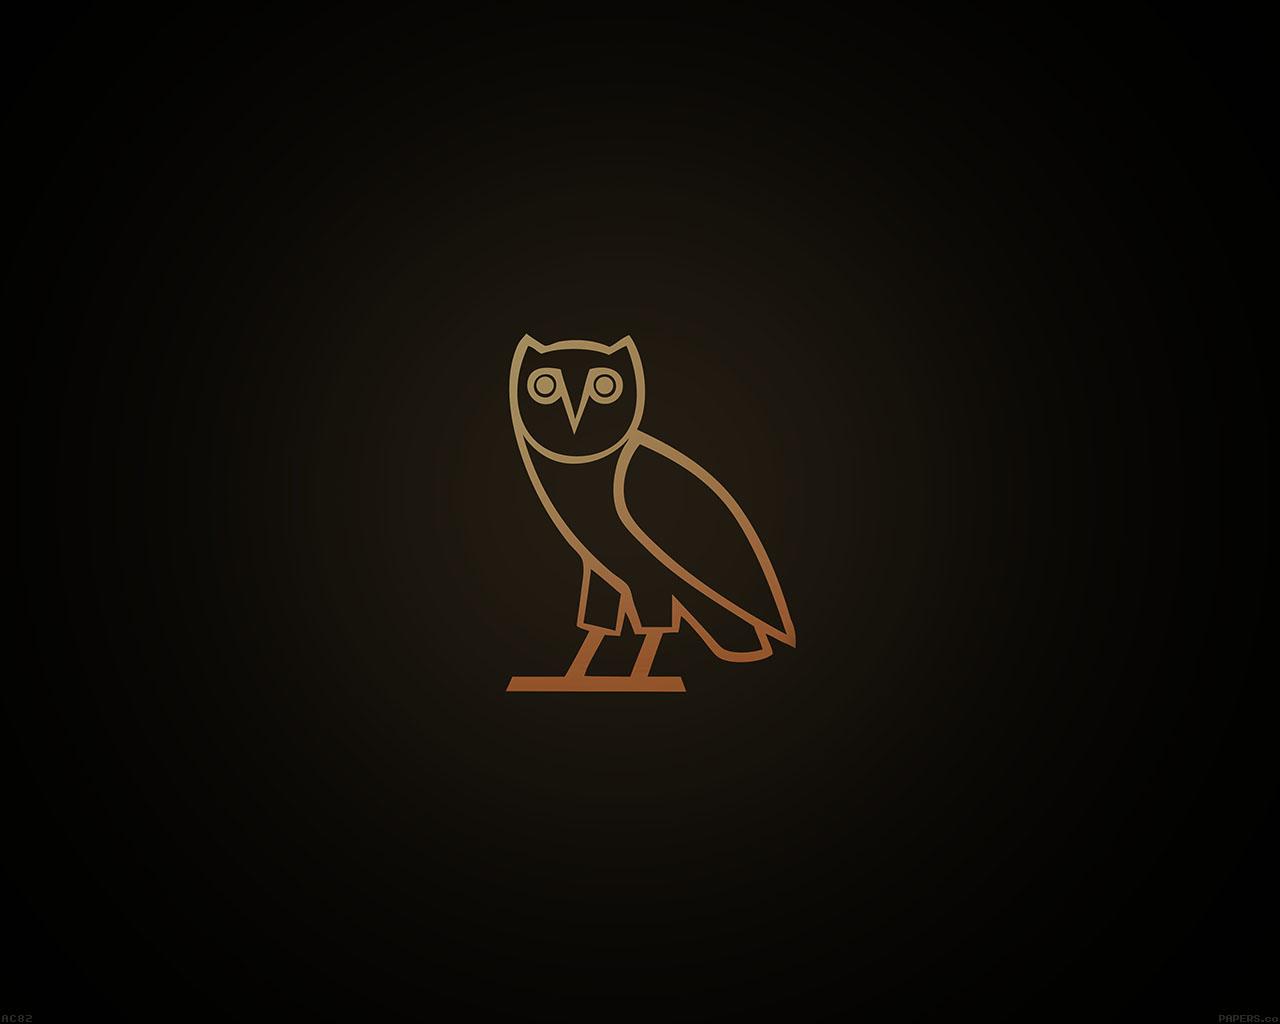 ac82-wallpaper-ovo-owl-logo-dark-minimal - Papers.co